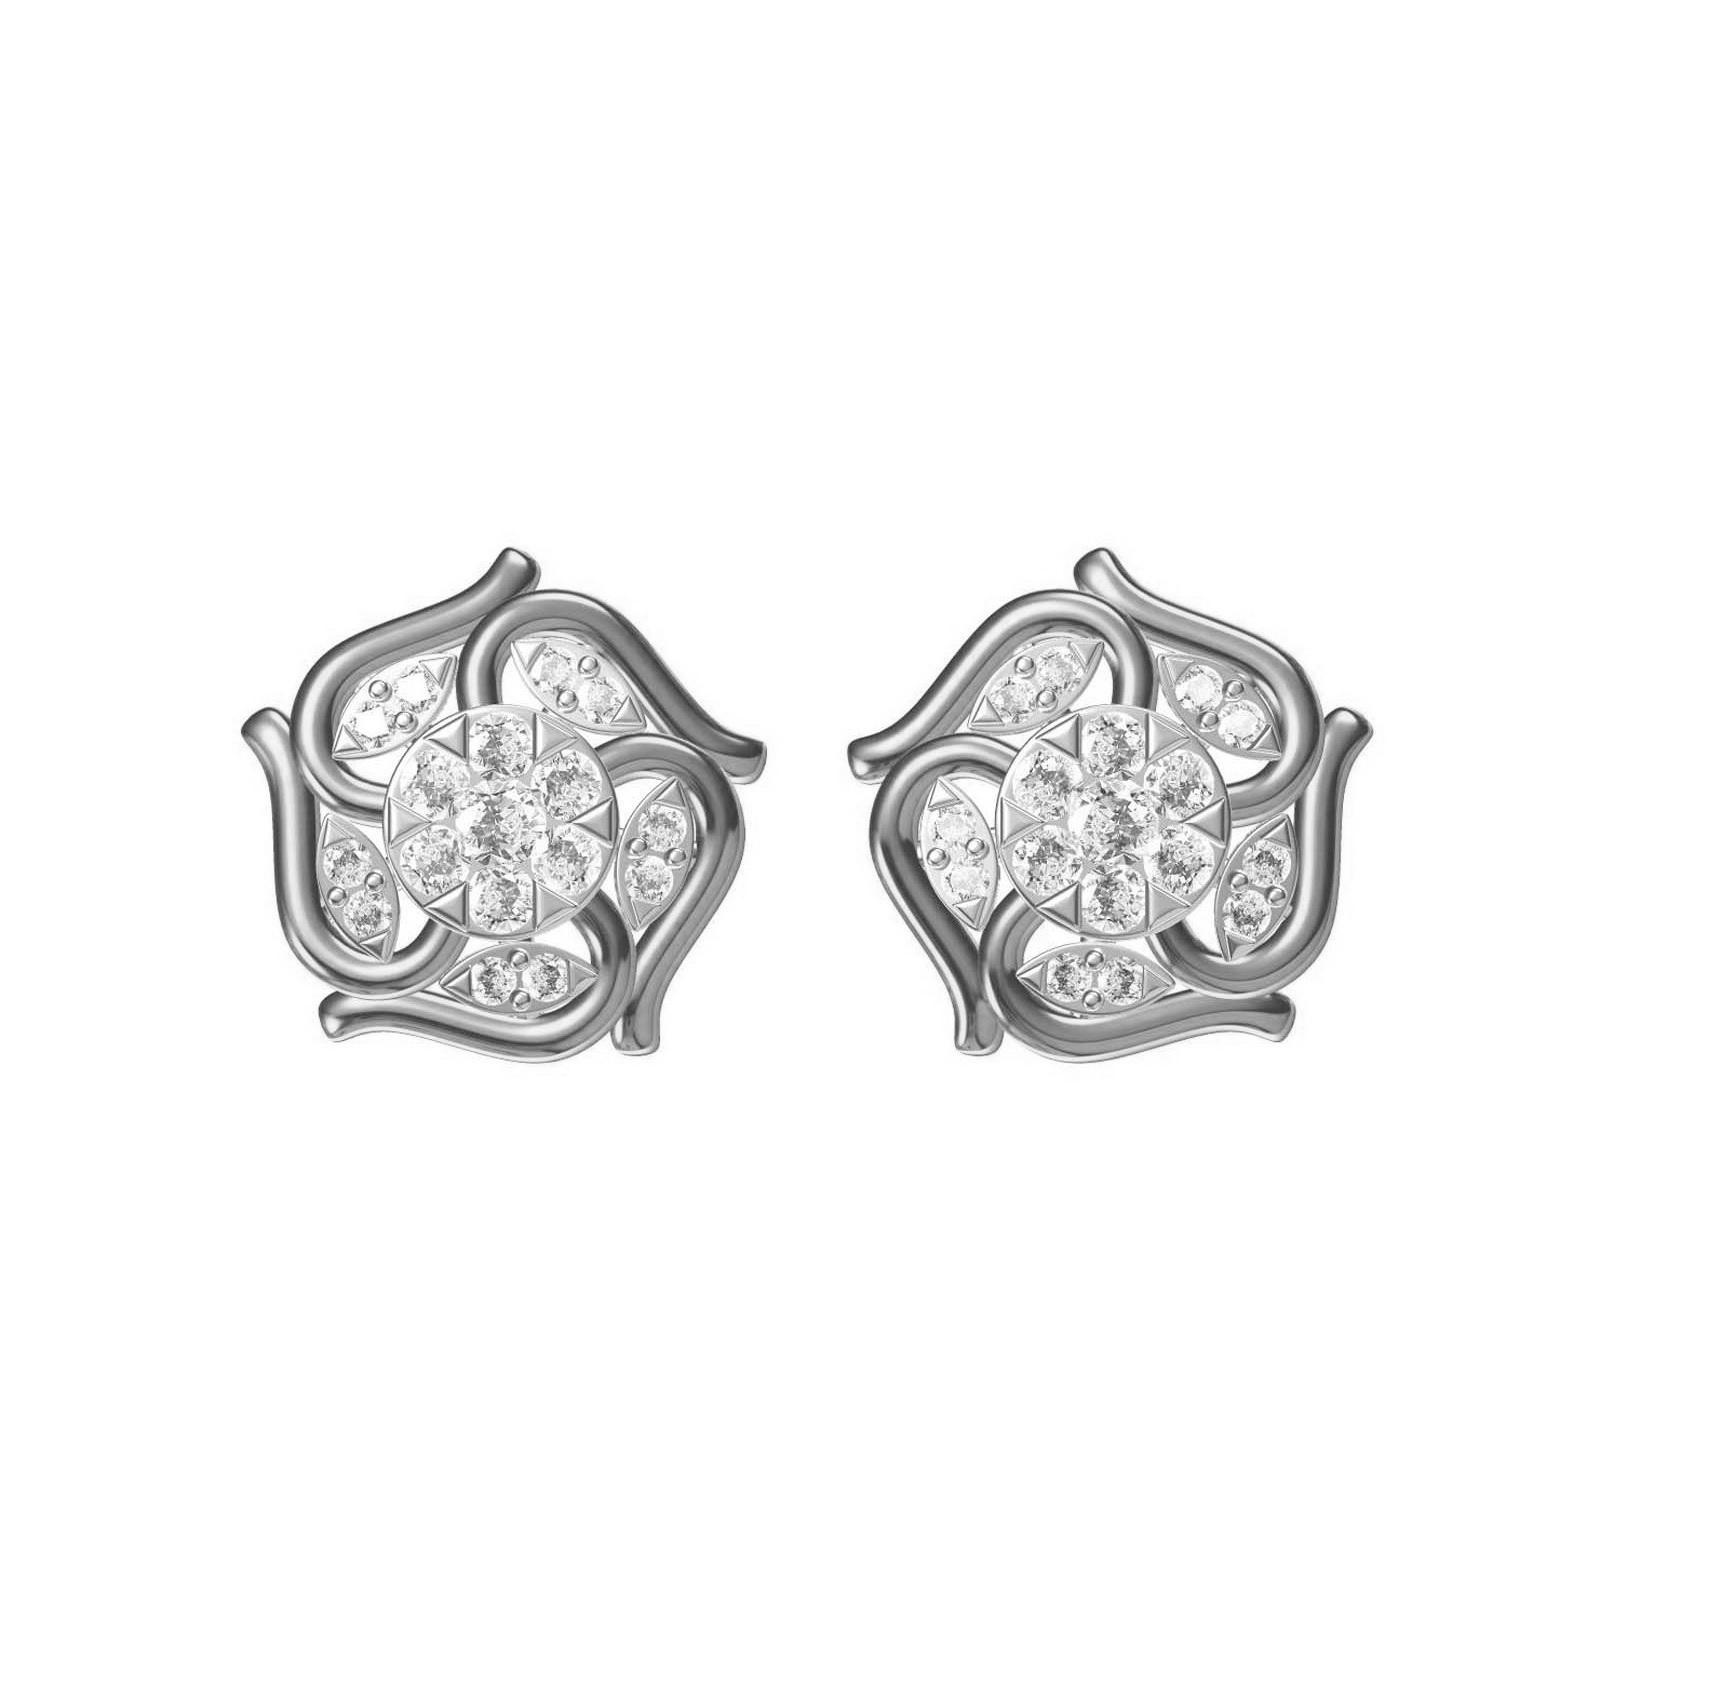 Diamond Earring TCW 0.428 14K gold 4.1 gm